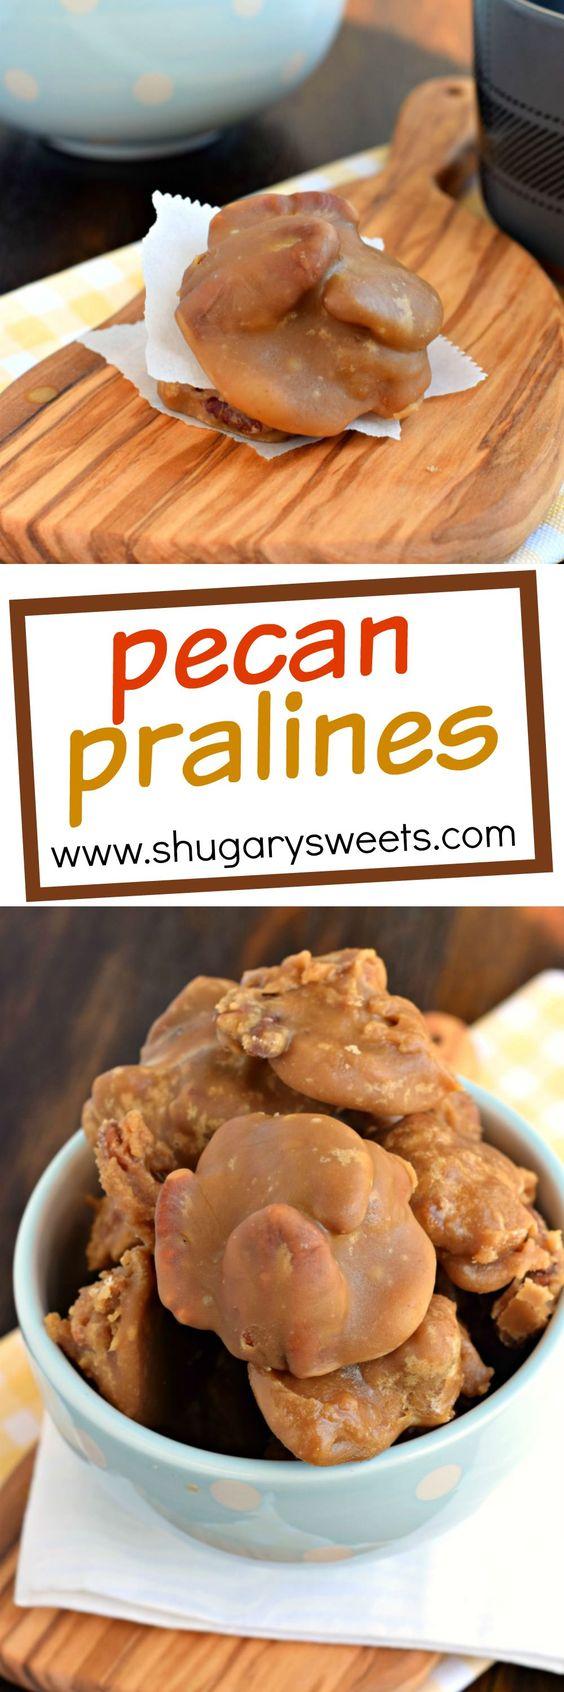 Pecan pralines, Pecans and Brown sugar on Pinterest